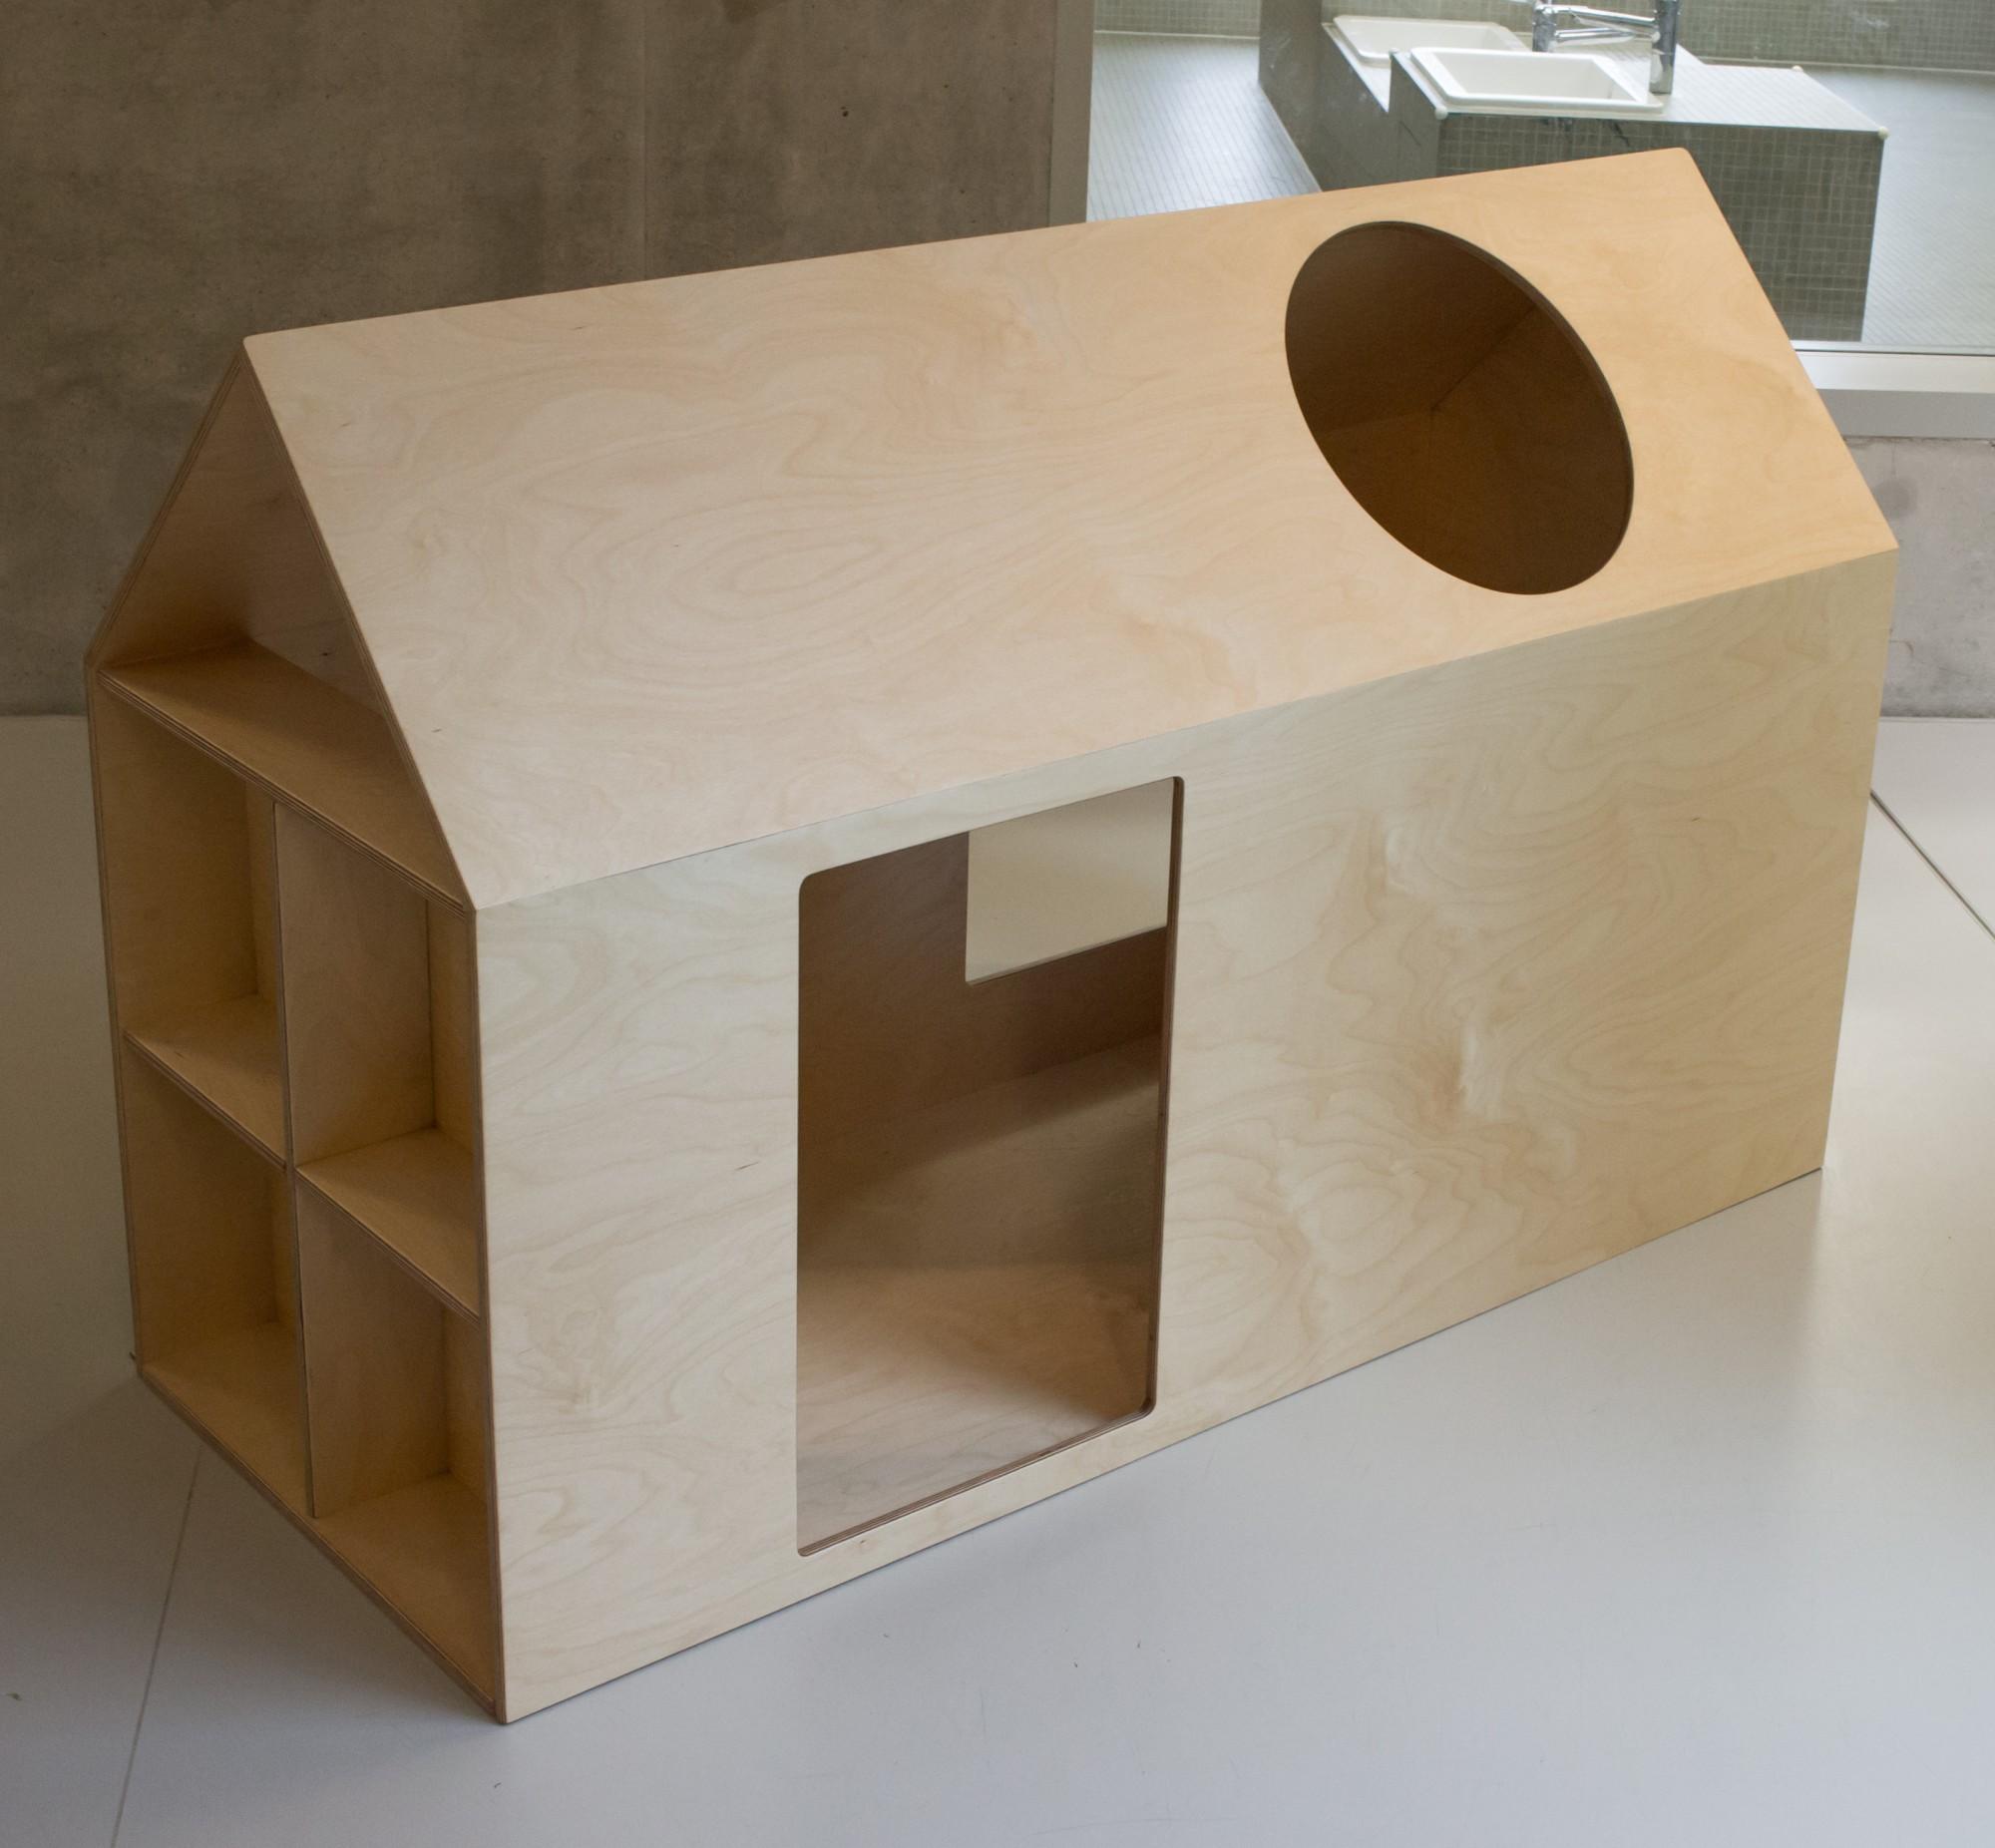 Kinderhaus-Modell-50-Kopie-e1458067510861